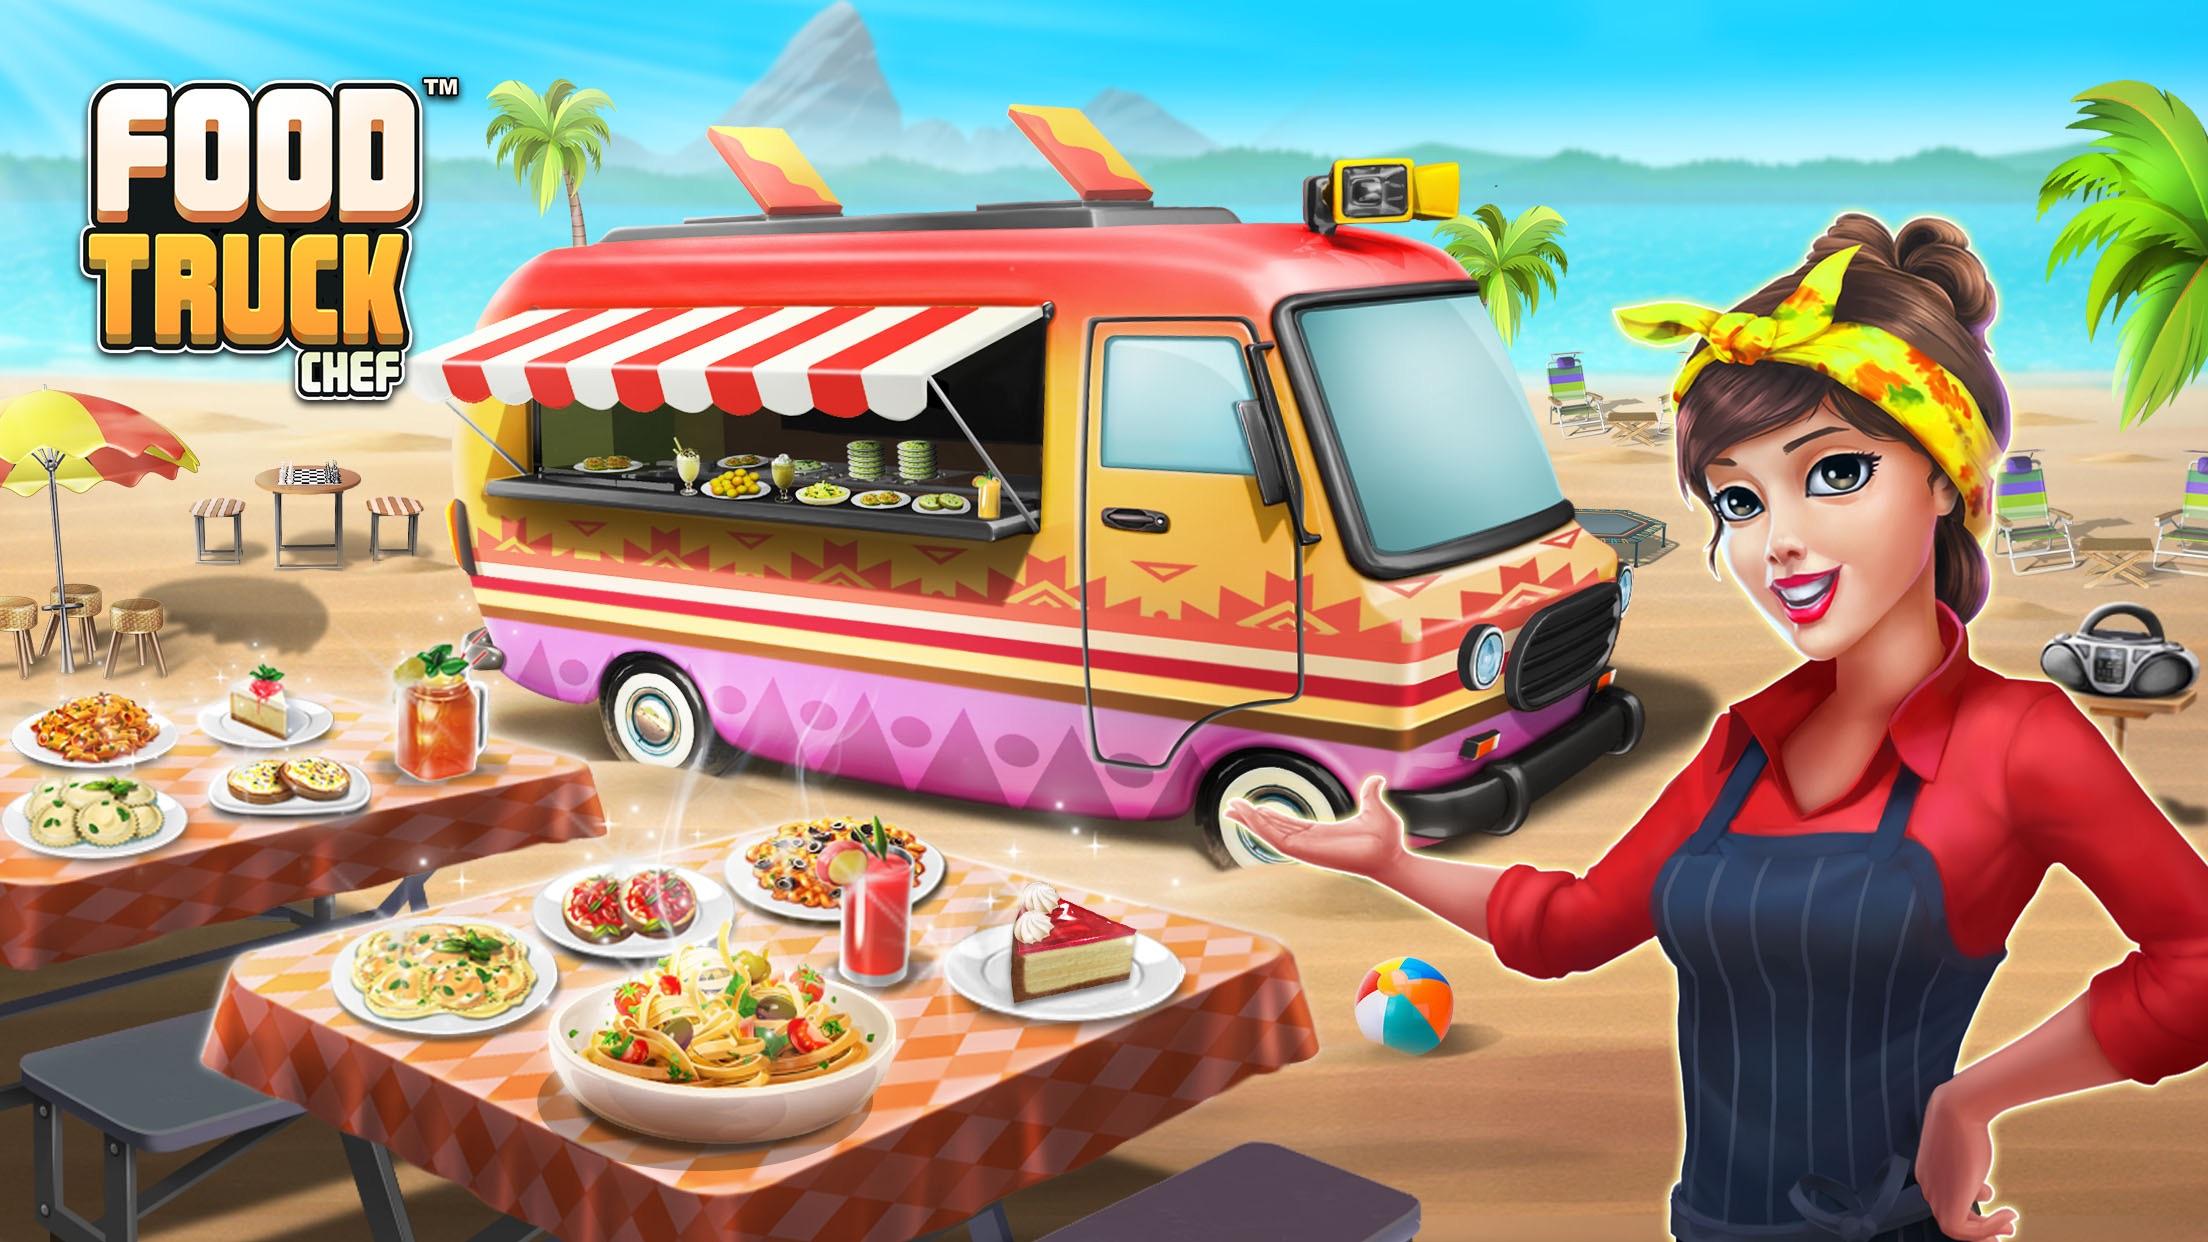 Food Truck Chef™: Cooking Game Screenshot